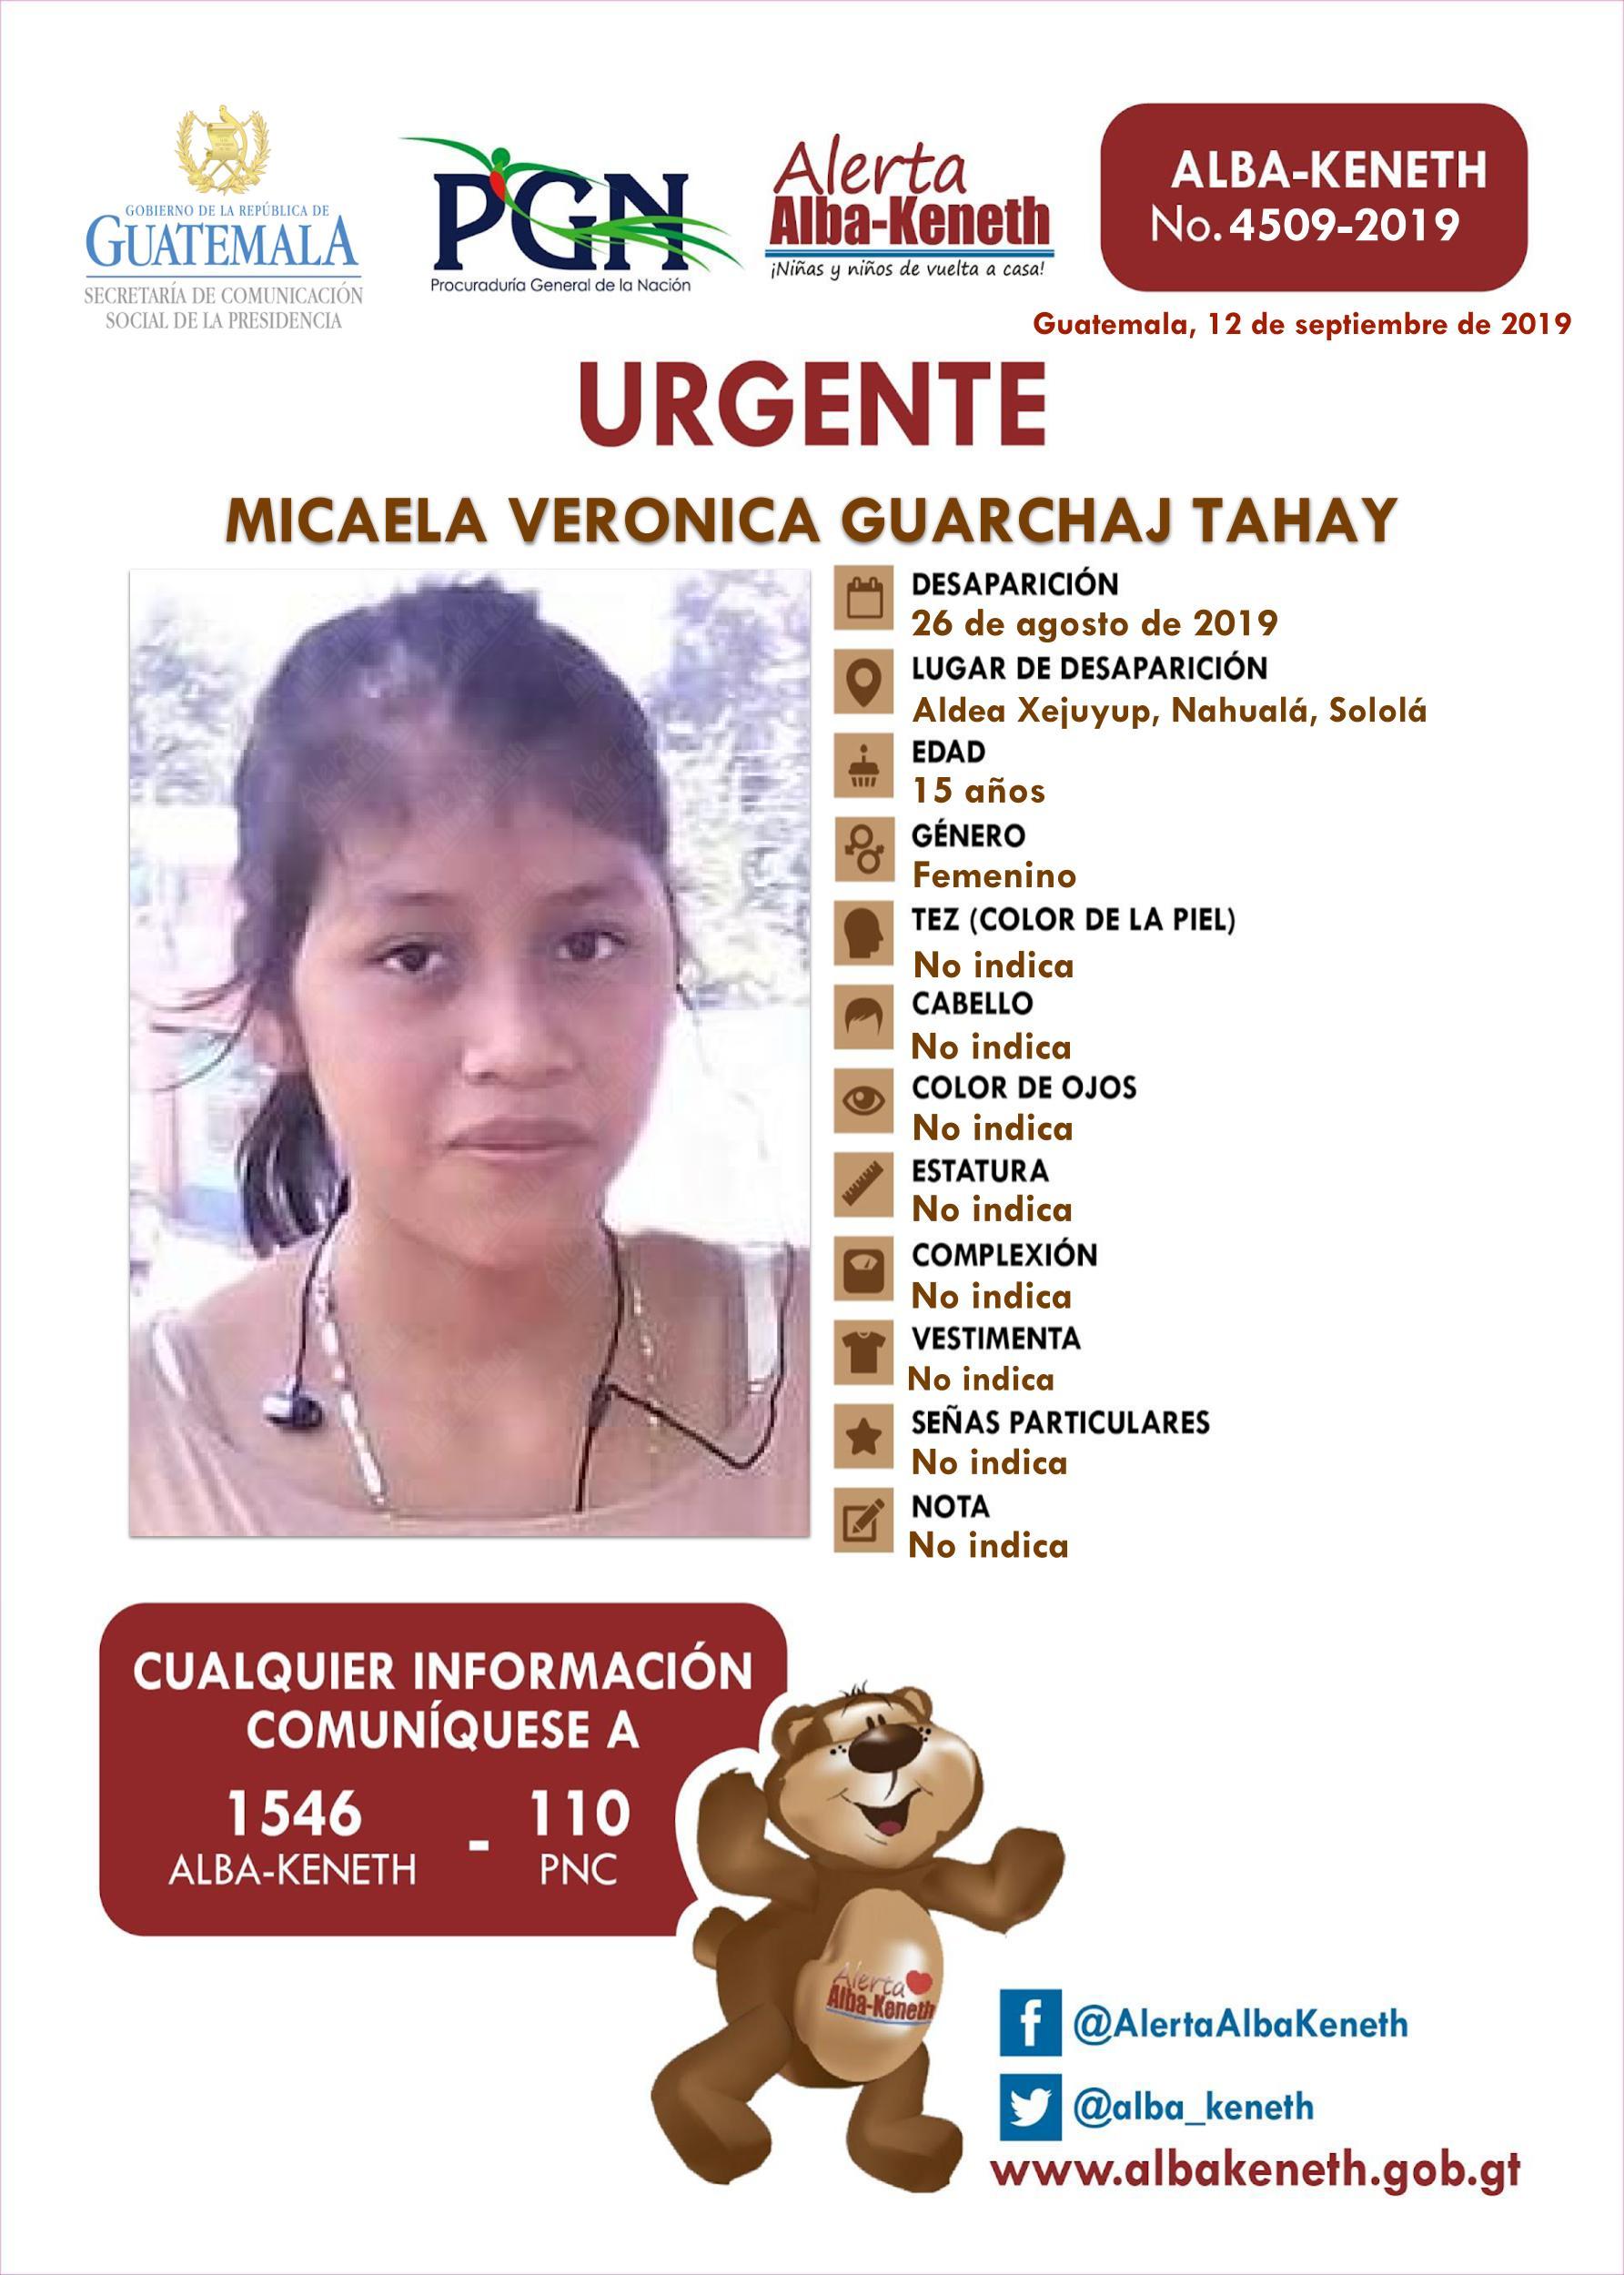 Micaela Veronica Guarchaj Tahay